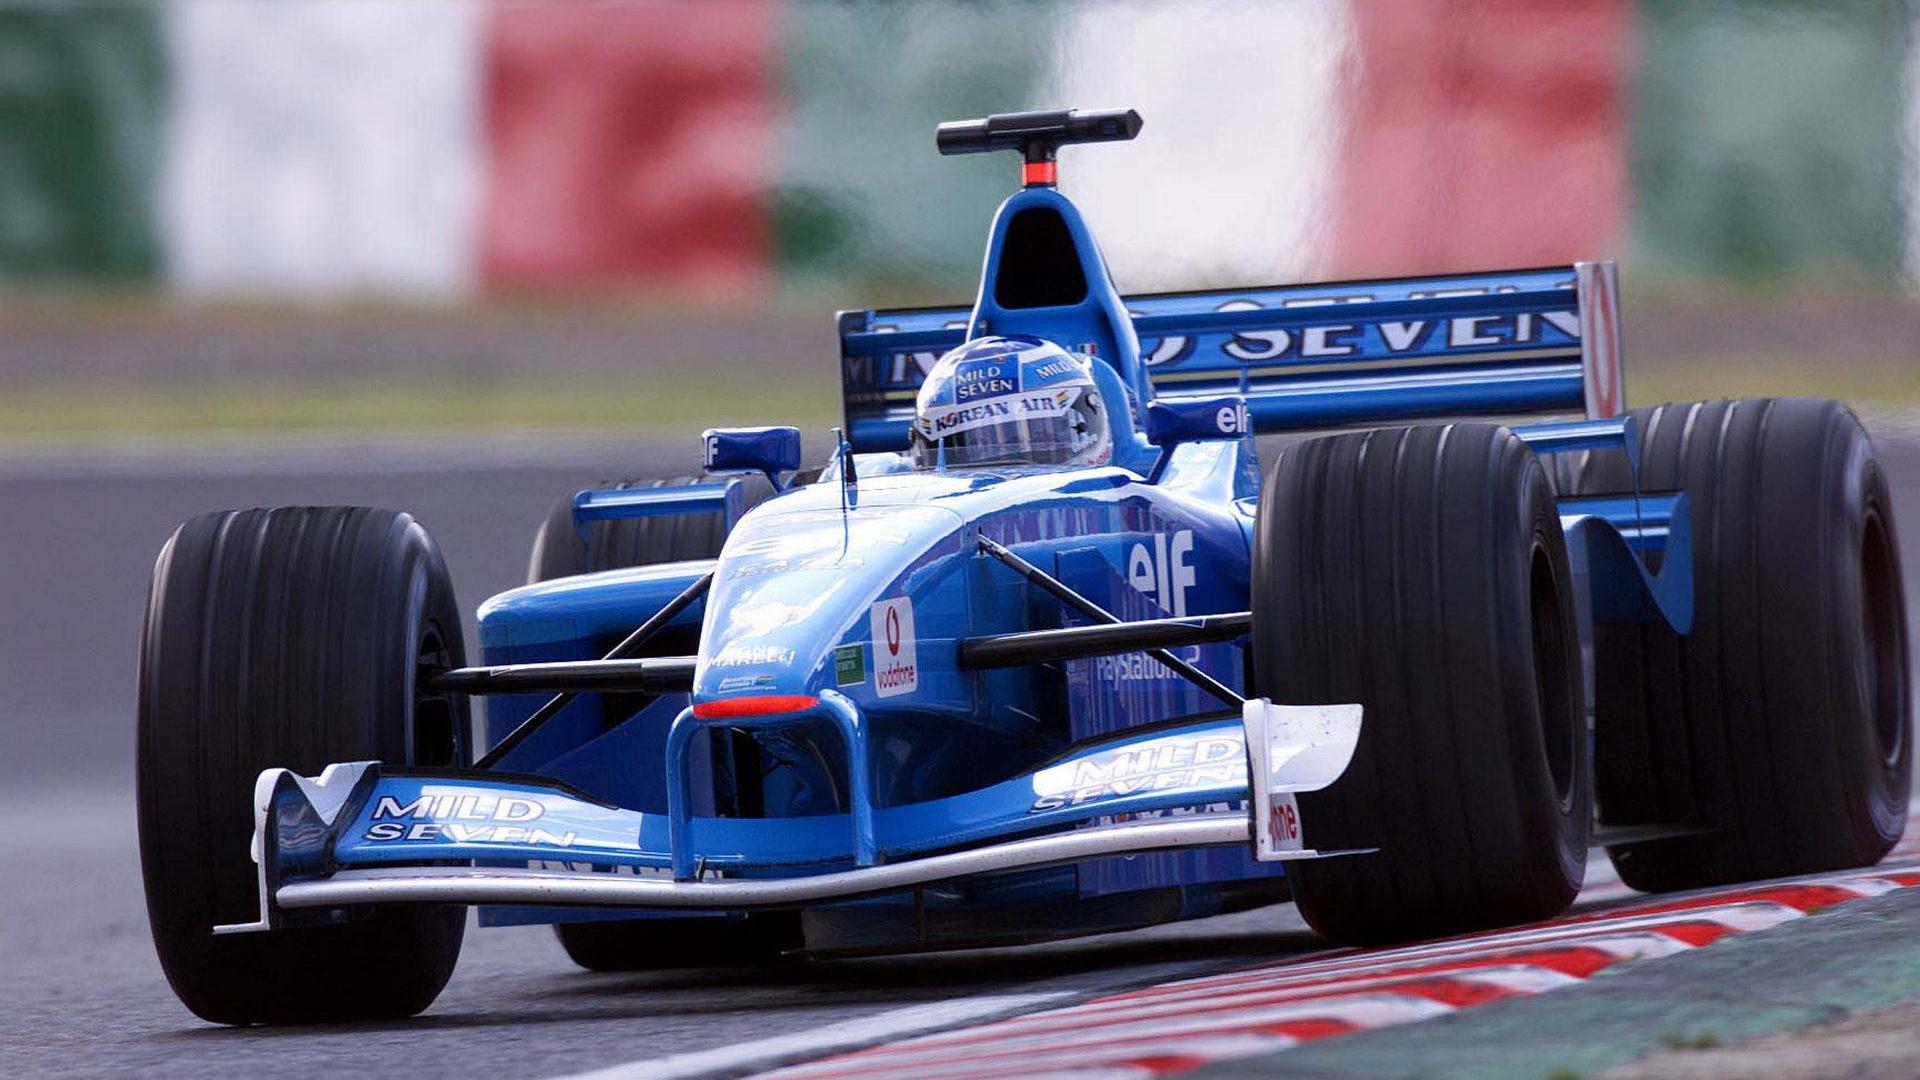 Benetton F1 2001 - foto by F1-Fansite.com